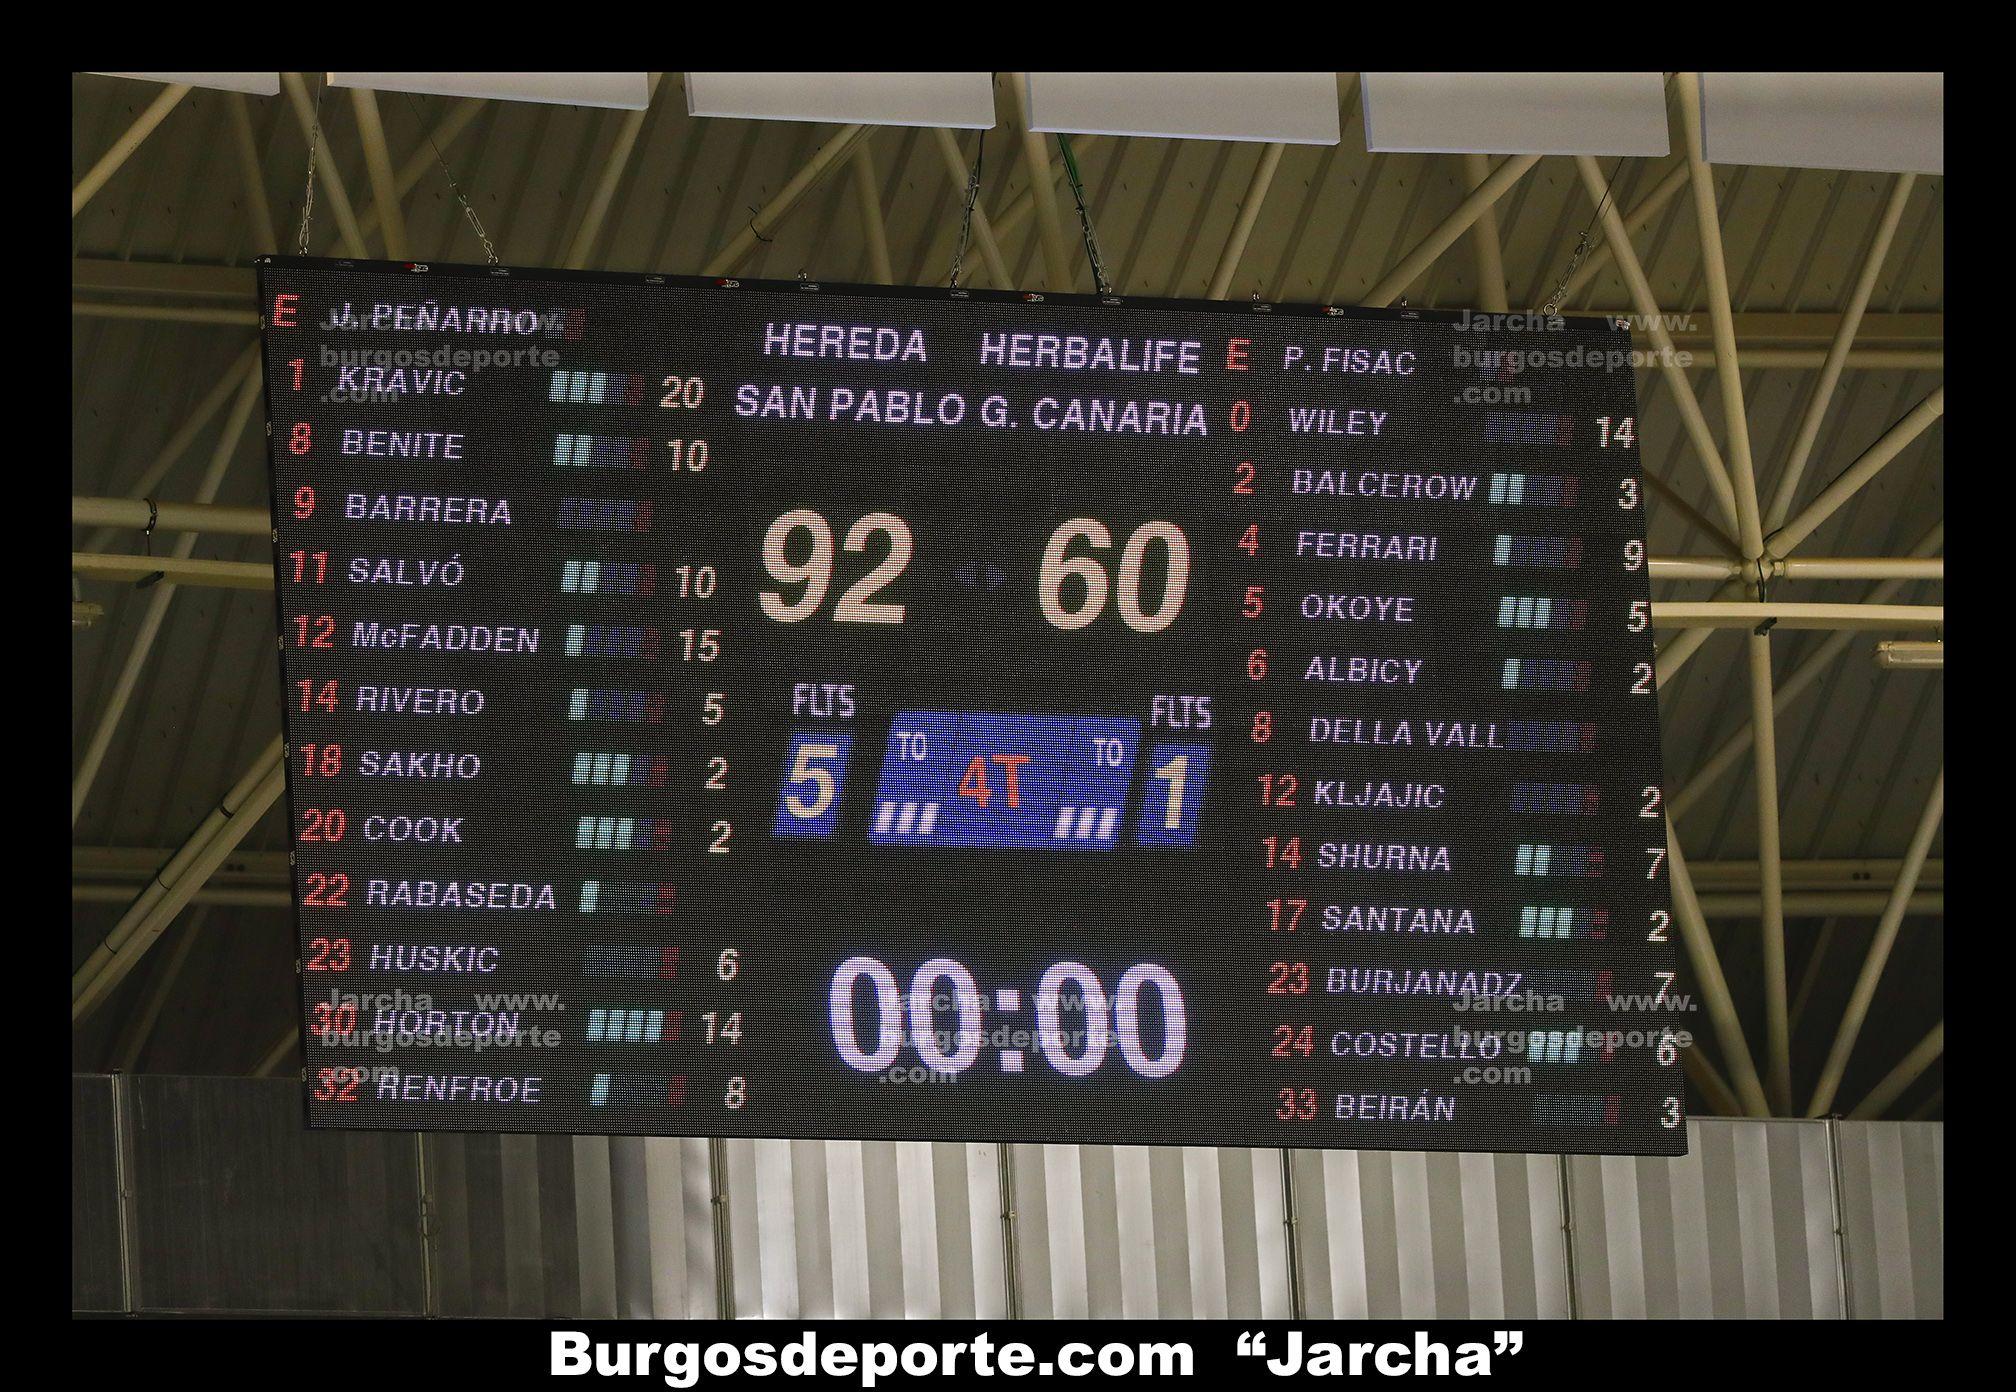 HEREDA SAN PABLO BURGOS 92 - HERBALIFE GC 60